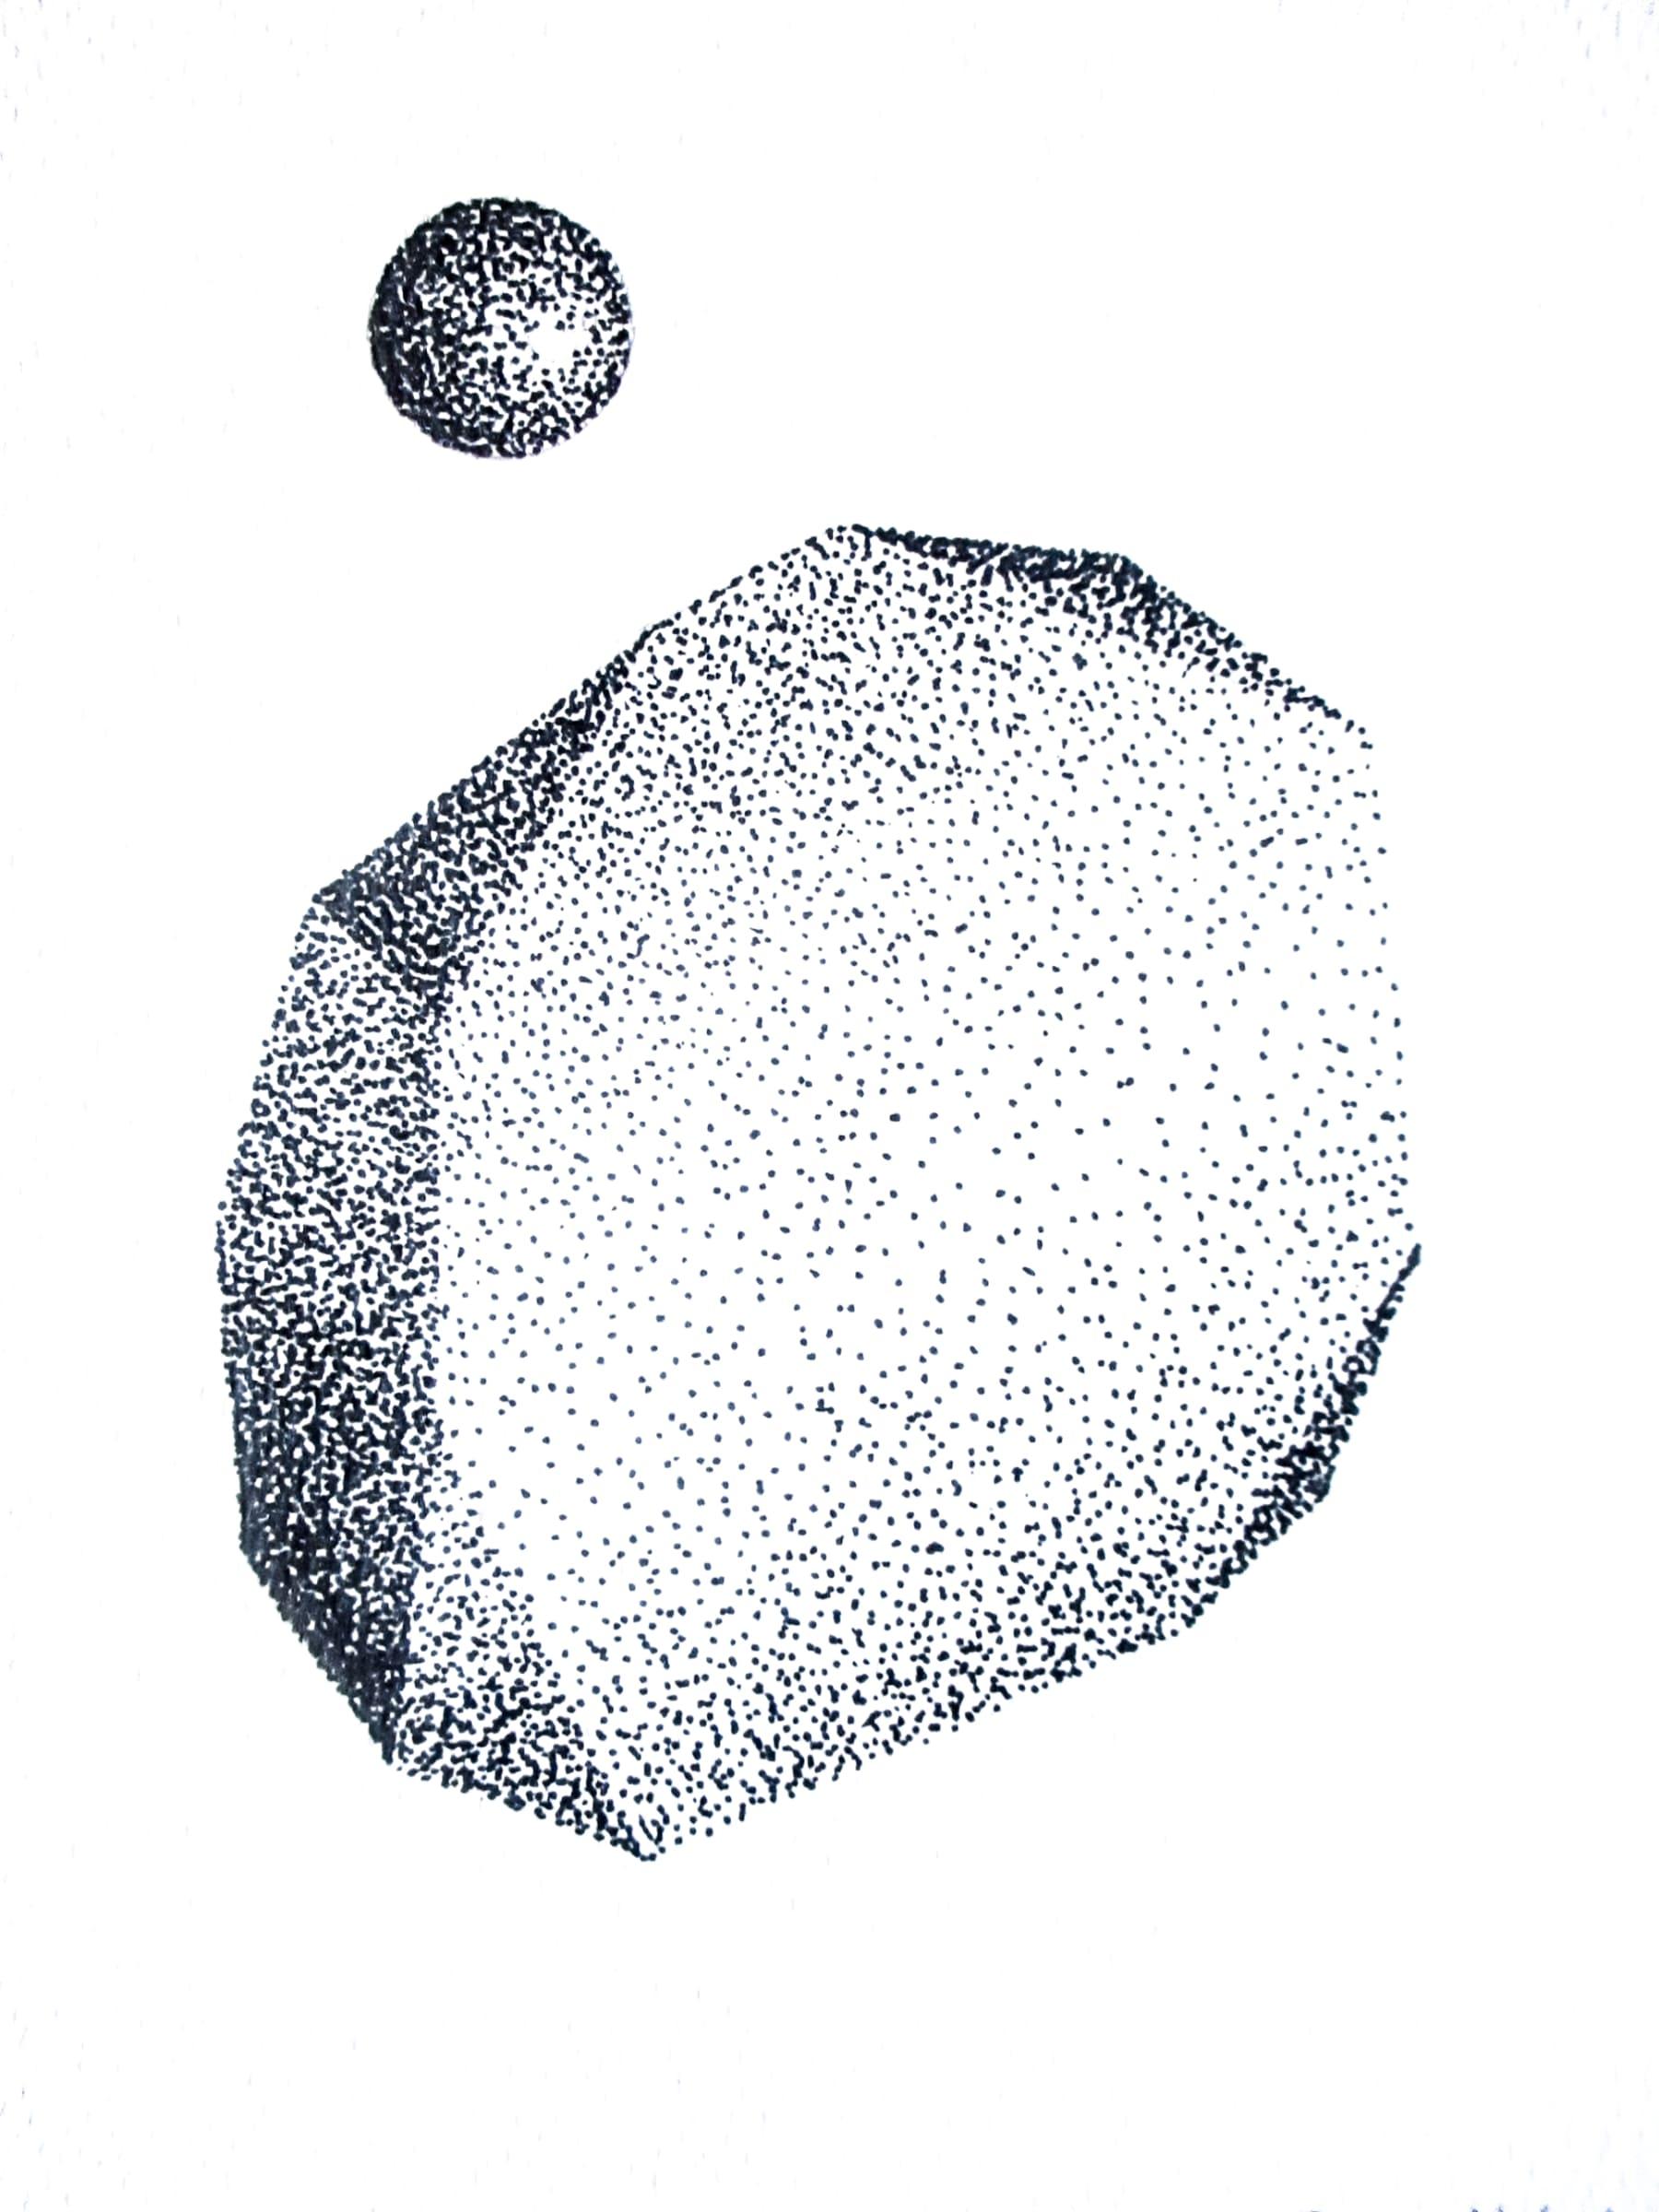 <span class=&#34;link fancybox-details-link&#34;><a href=&#34;/content/viewing-room/54/artworks2306/&#34;>View Detail Page</a></span><div class=&#34;medium&#34;>Ink On Watercolour Paper</div> <div class=&#34;dimensions&#34;>21cm x 14.8cm</div>